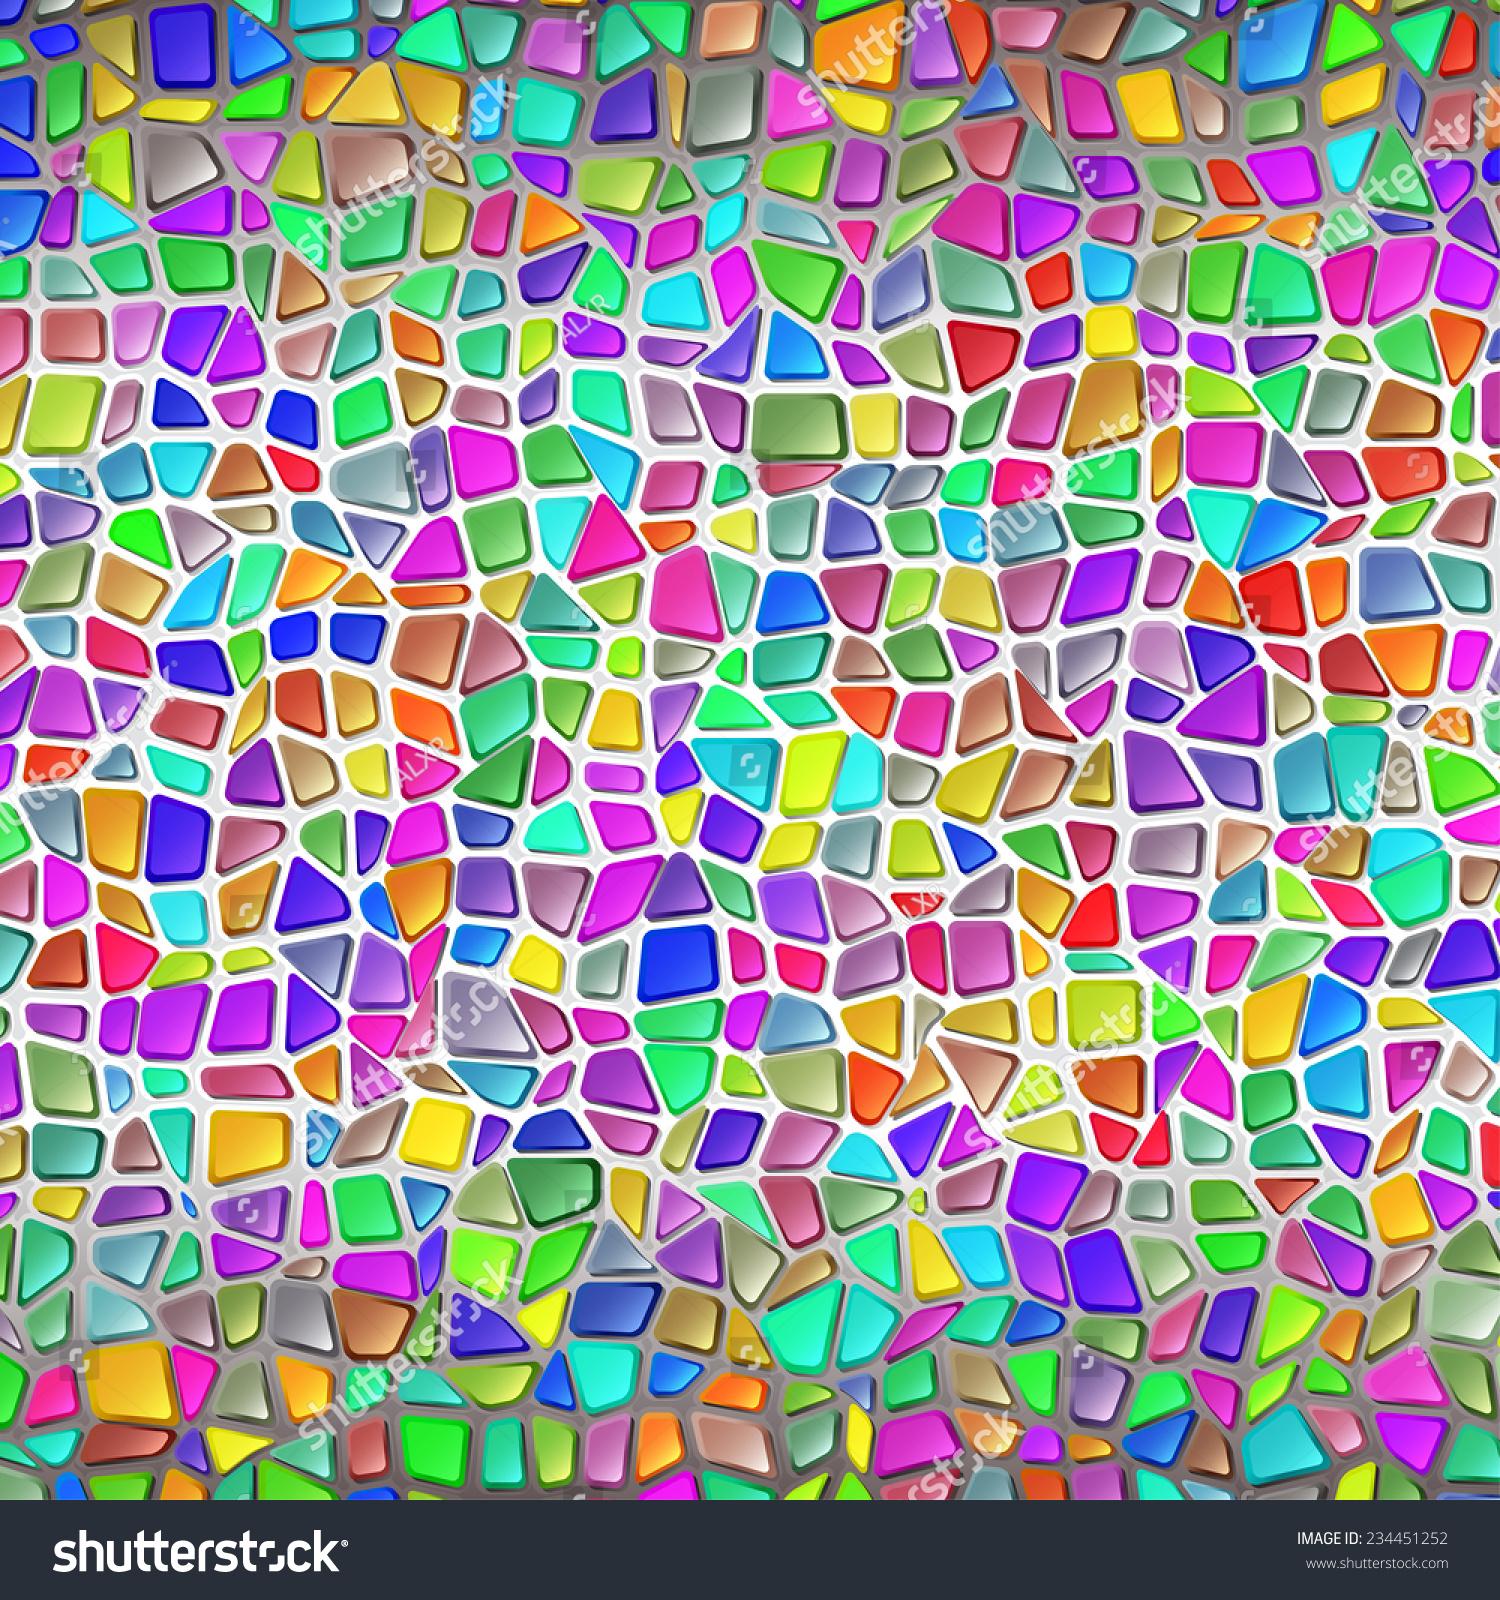 Wall Brilliant Stone Multicolored Mosaic Gaudis Stock Photo (Photo ...